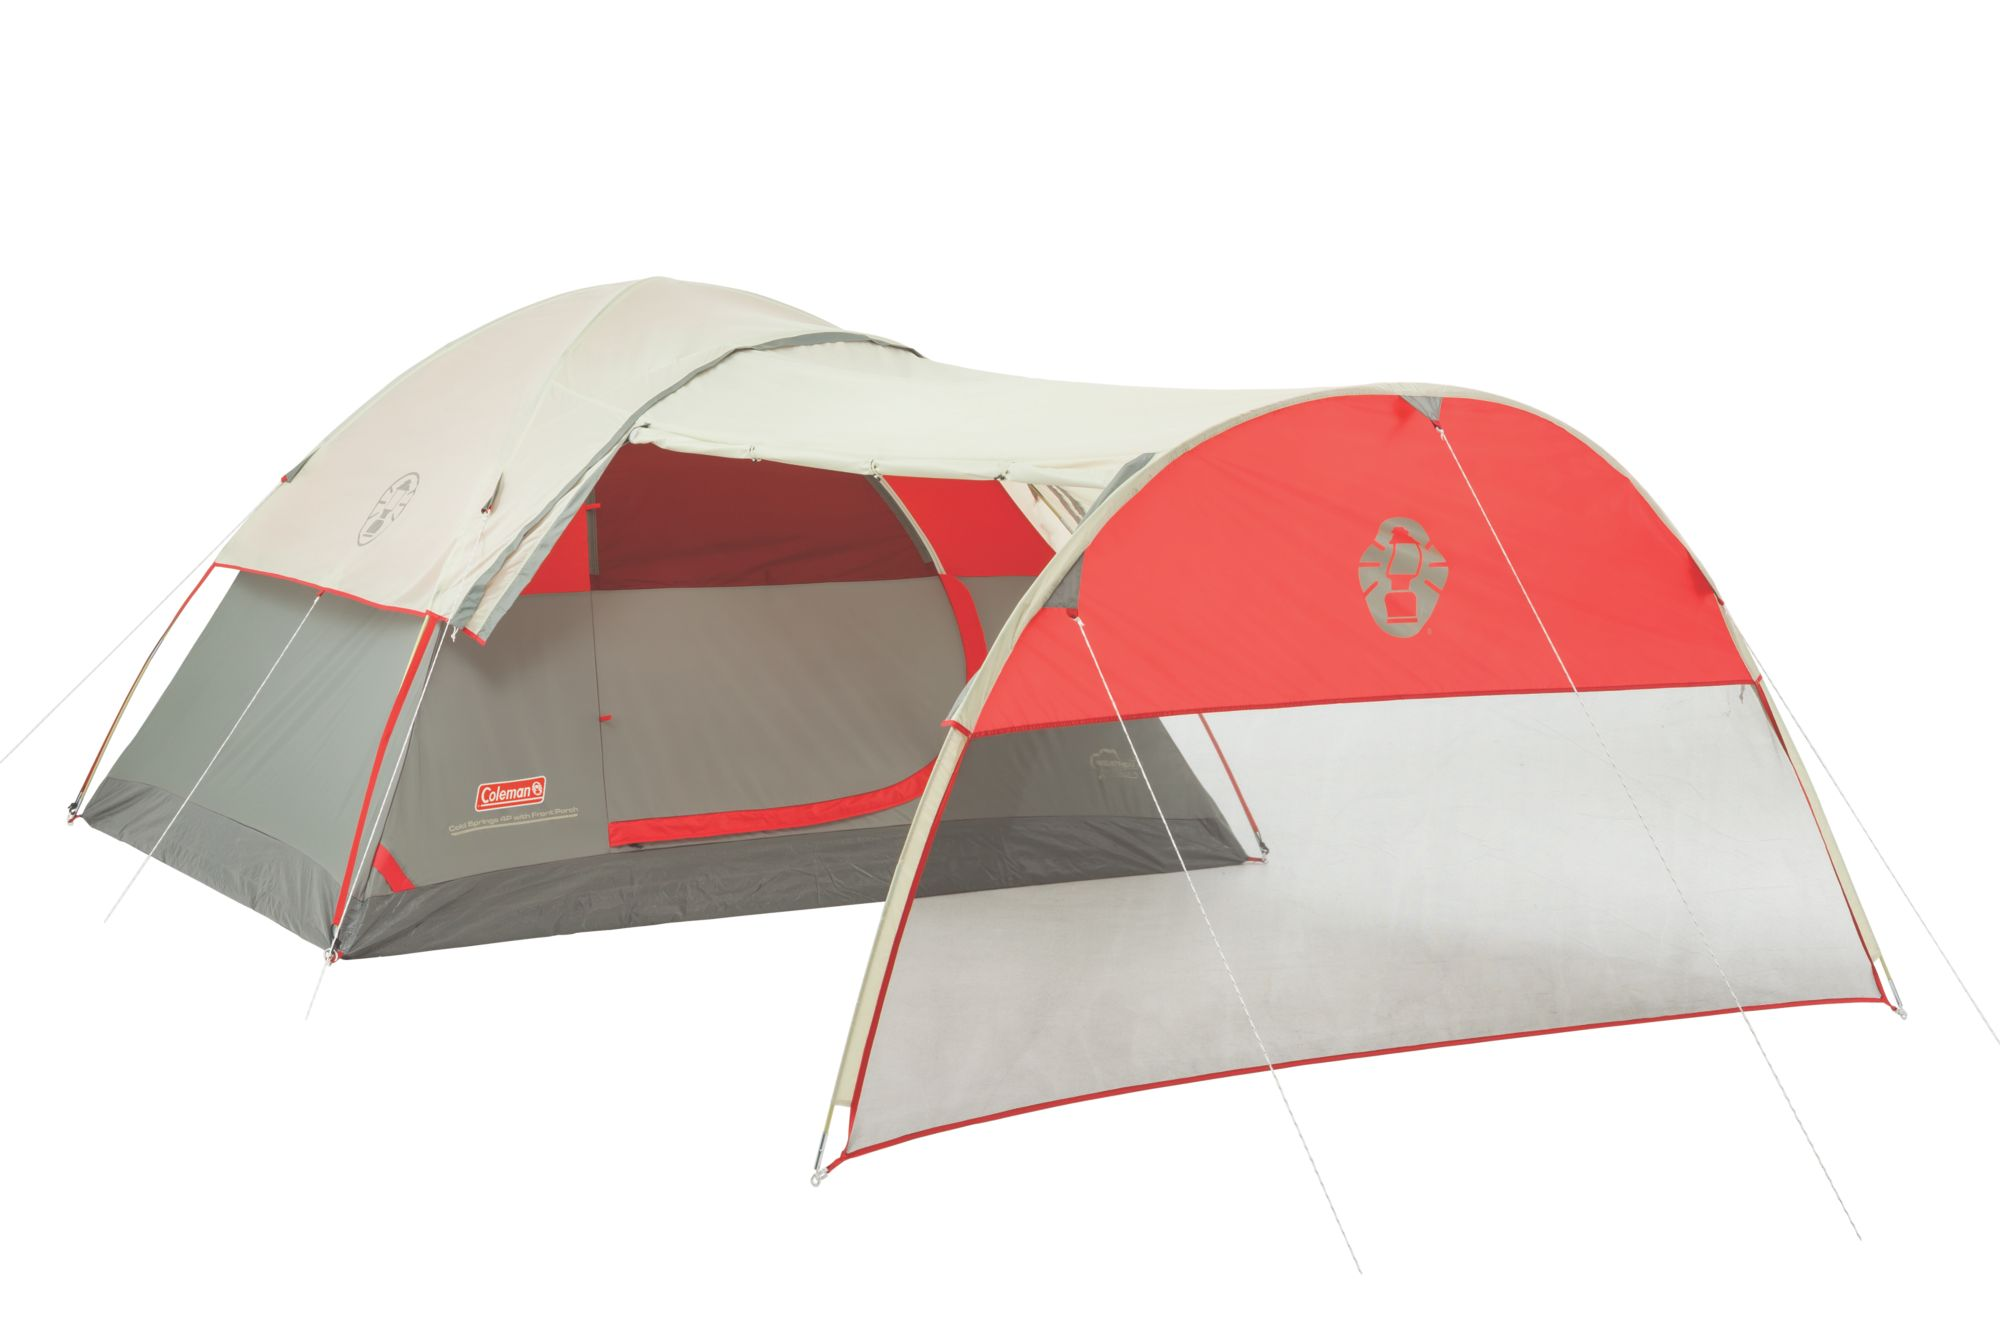 dome tents 4 man tent coleman